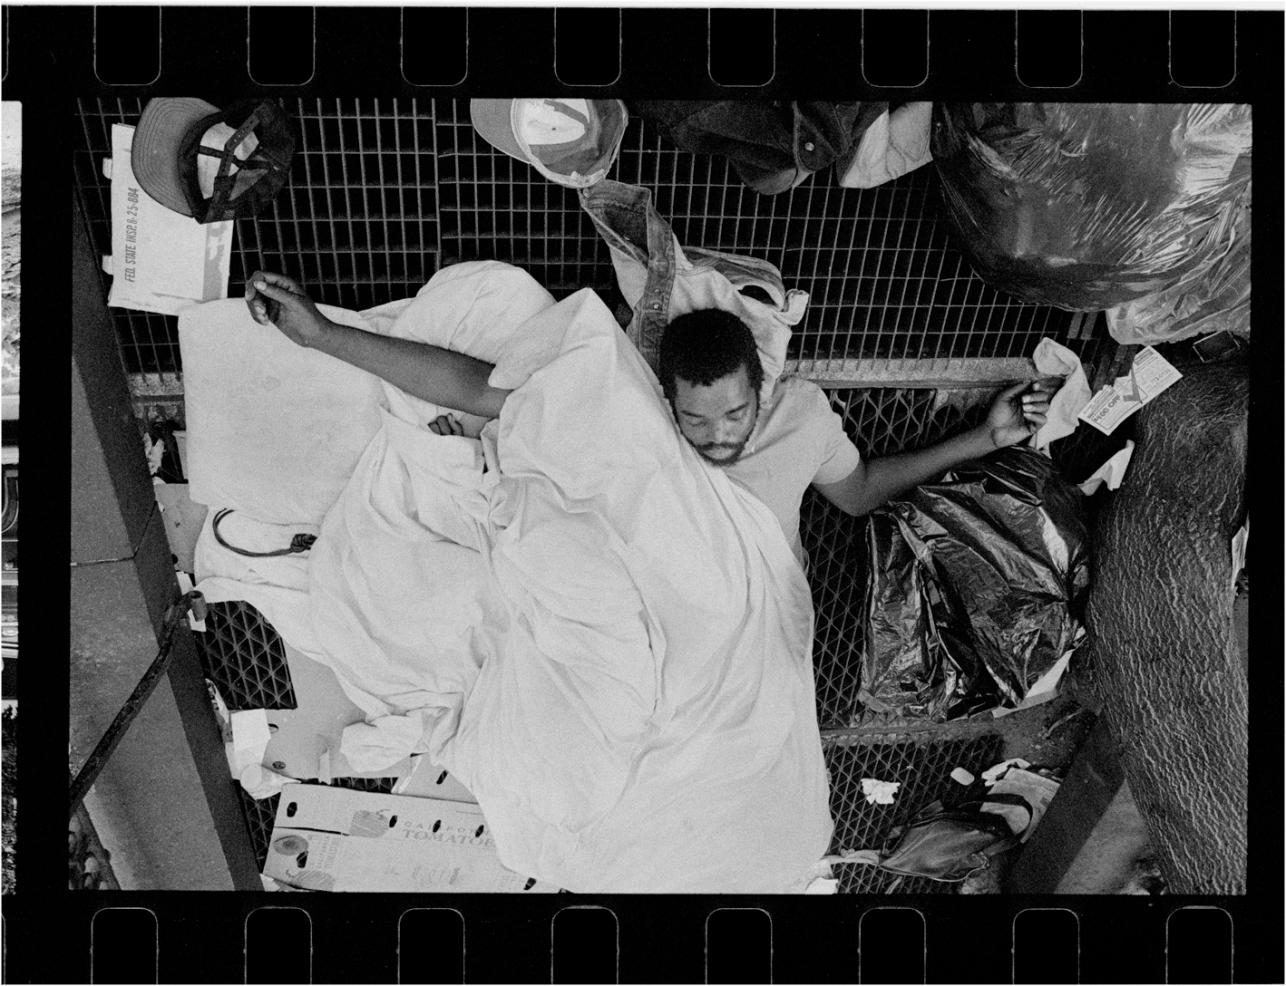 Homeless-Subway-Grating-1990 copy